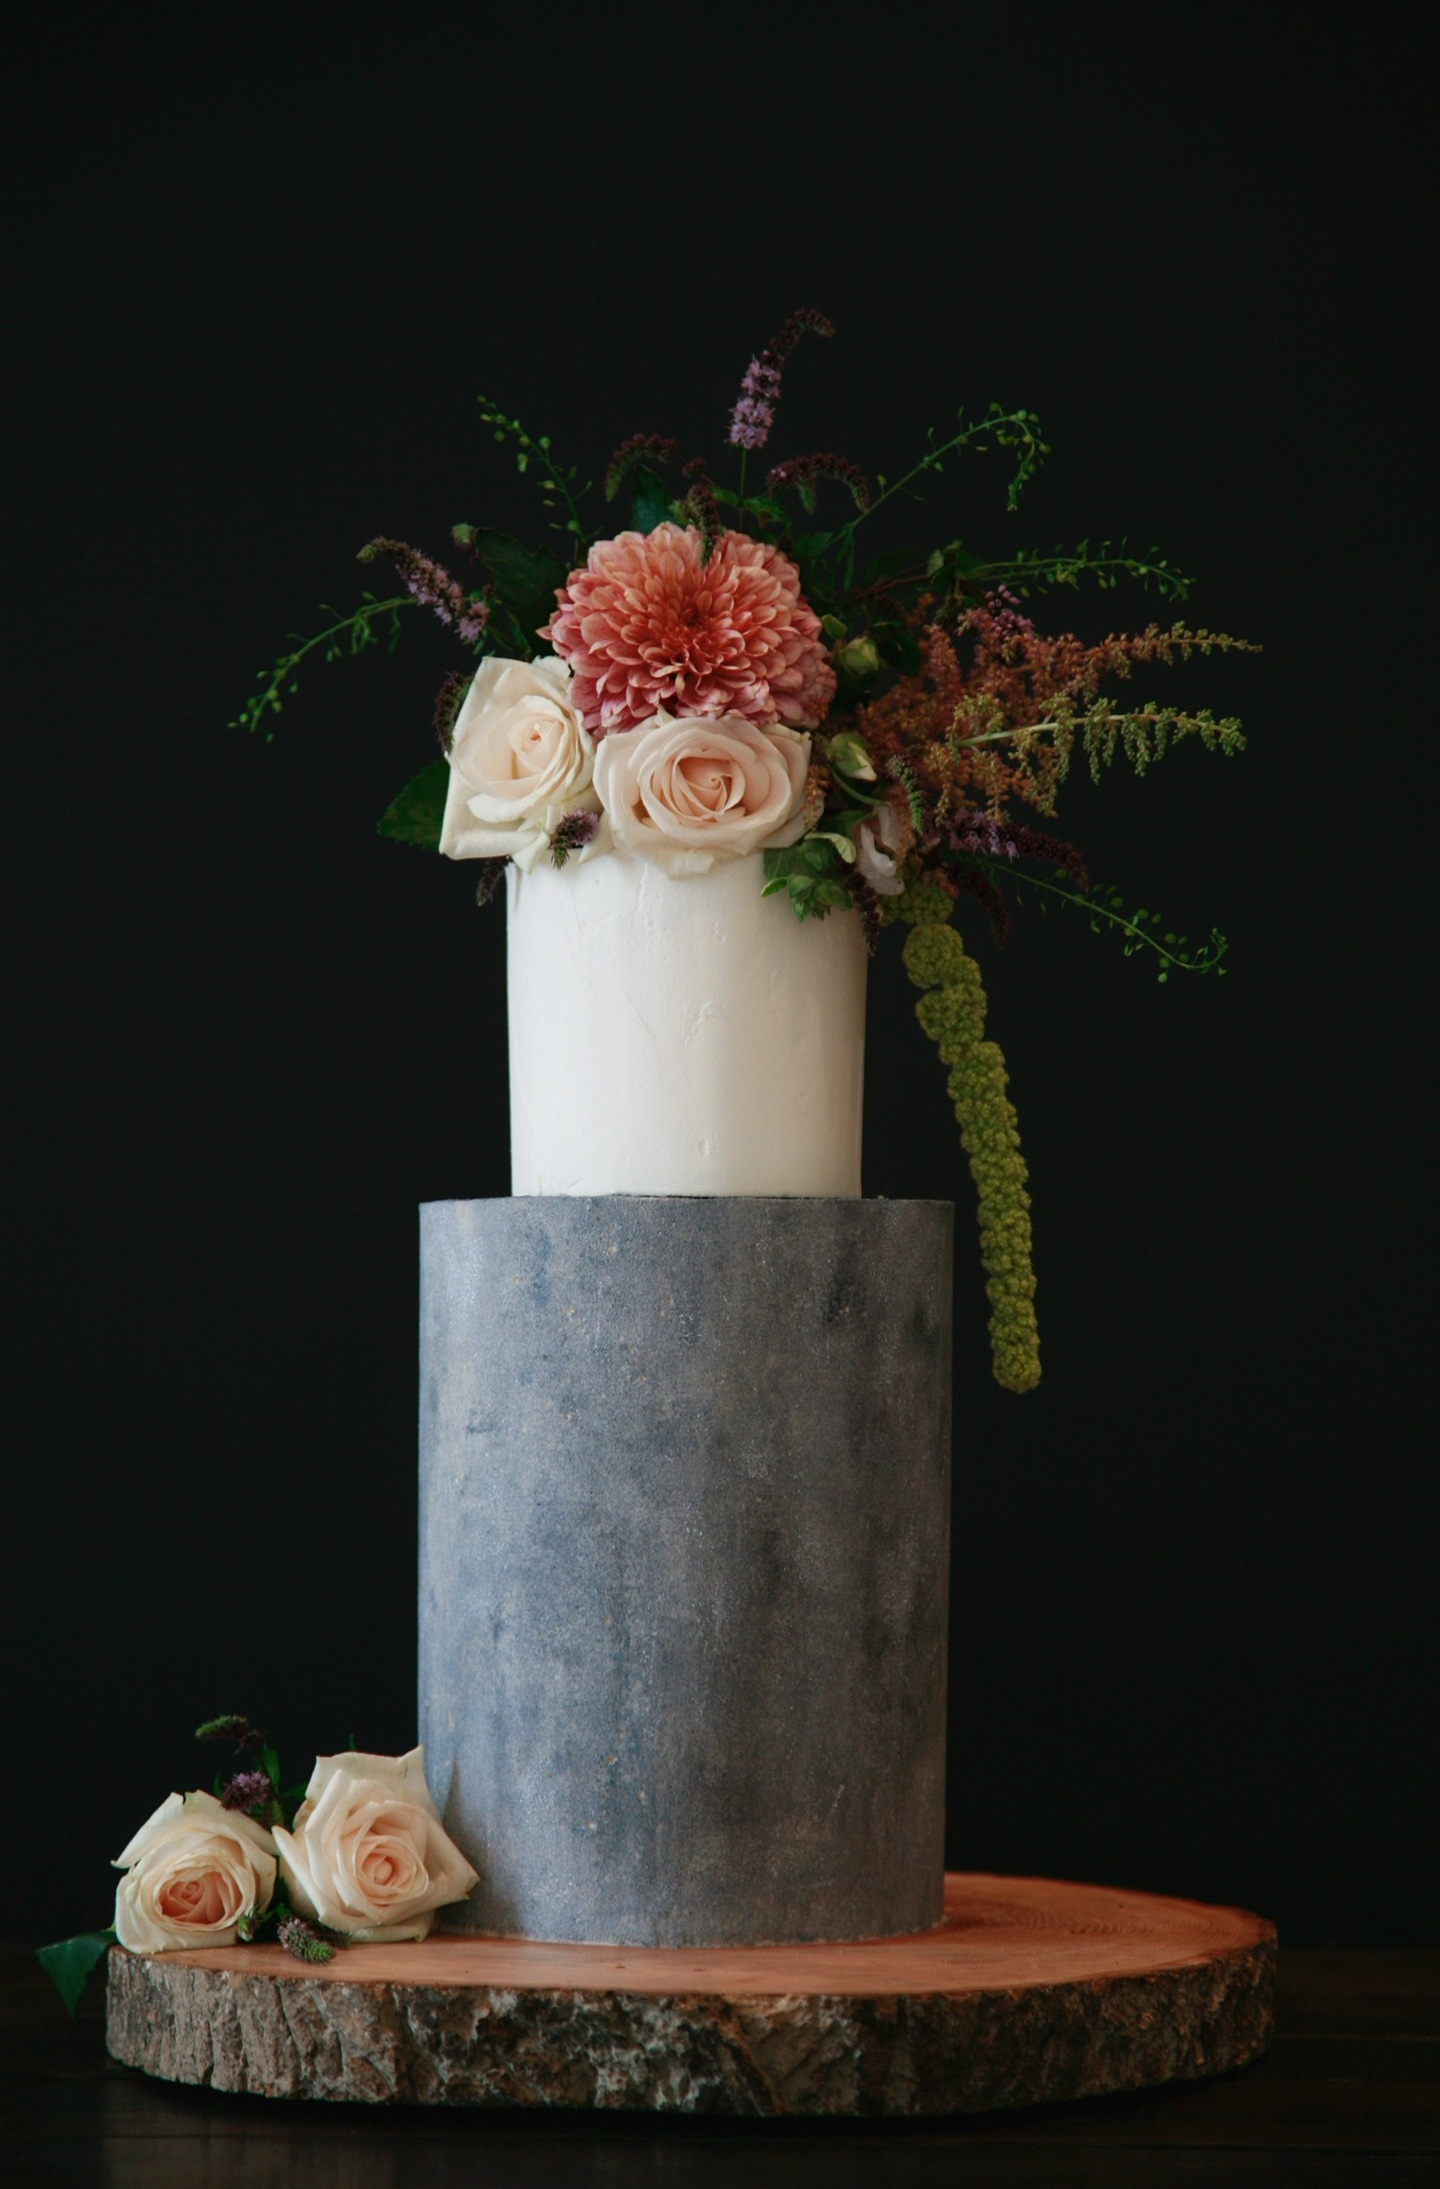 Concrete Wedding Cake Trend